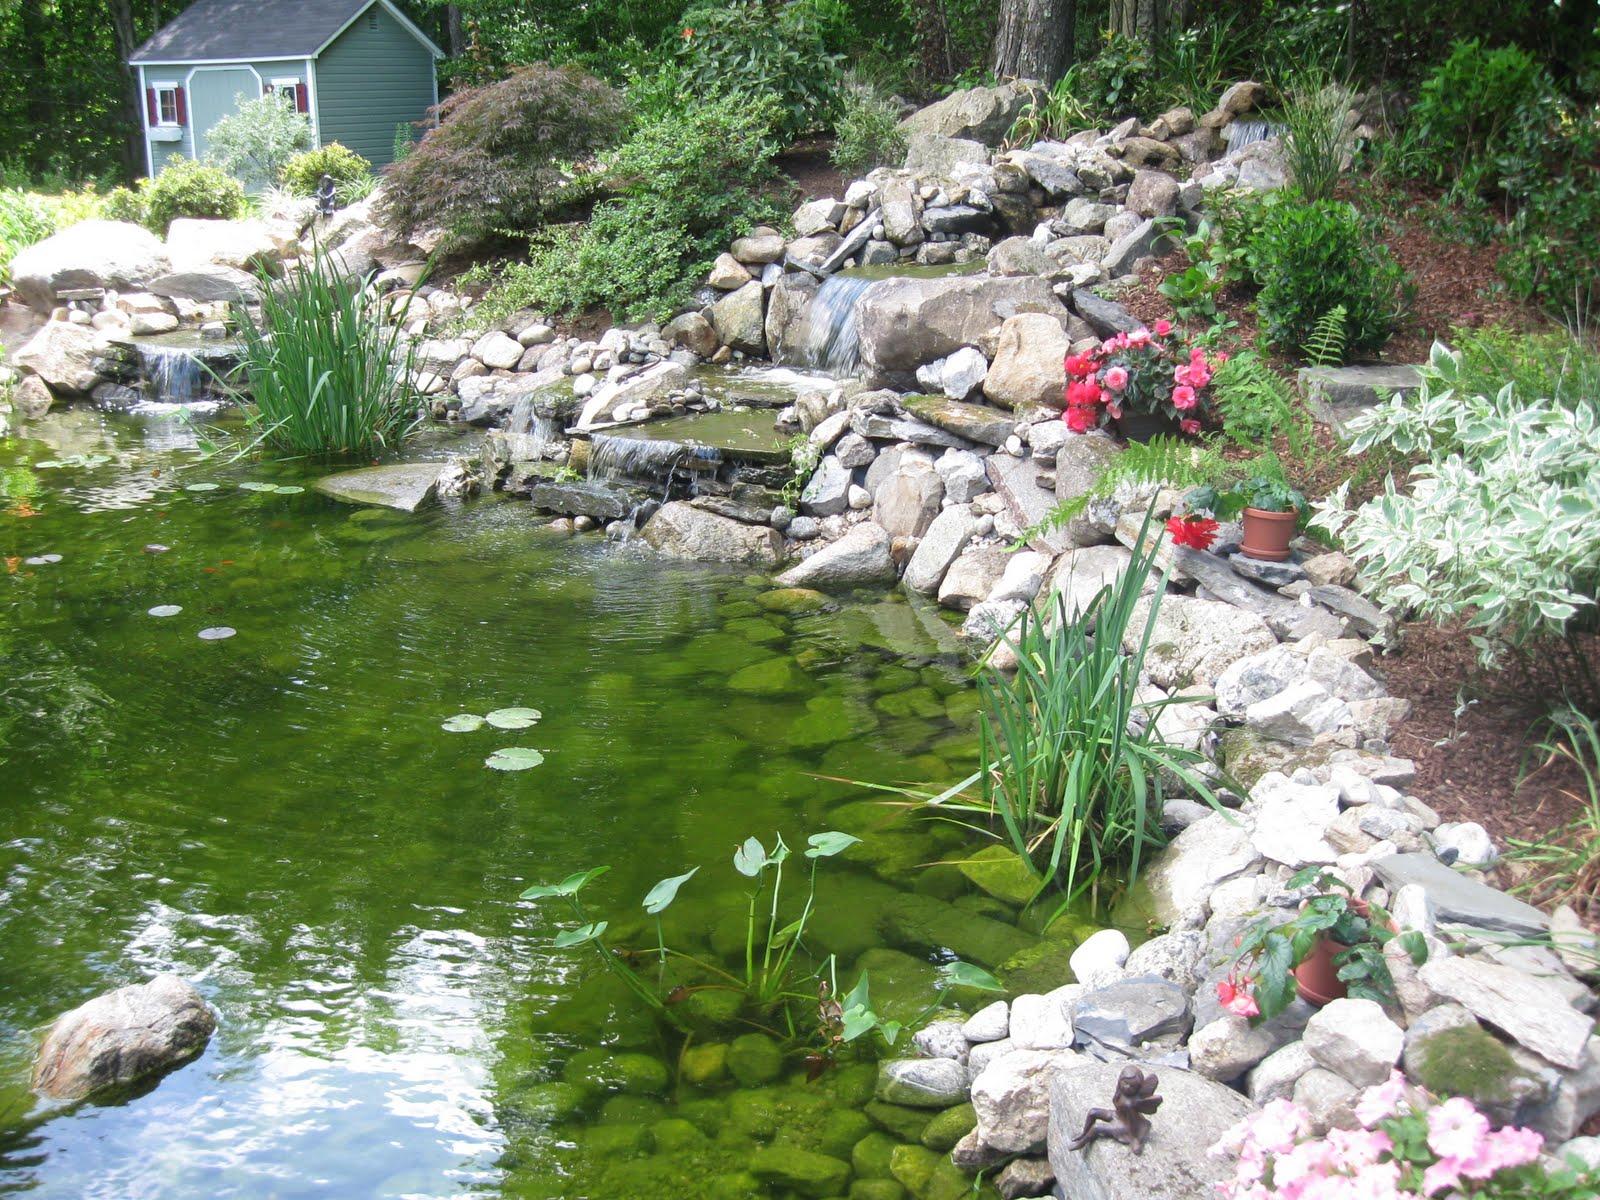 Photo of the garden pond # 26